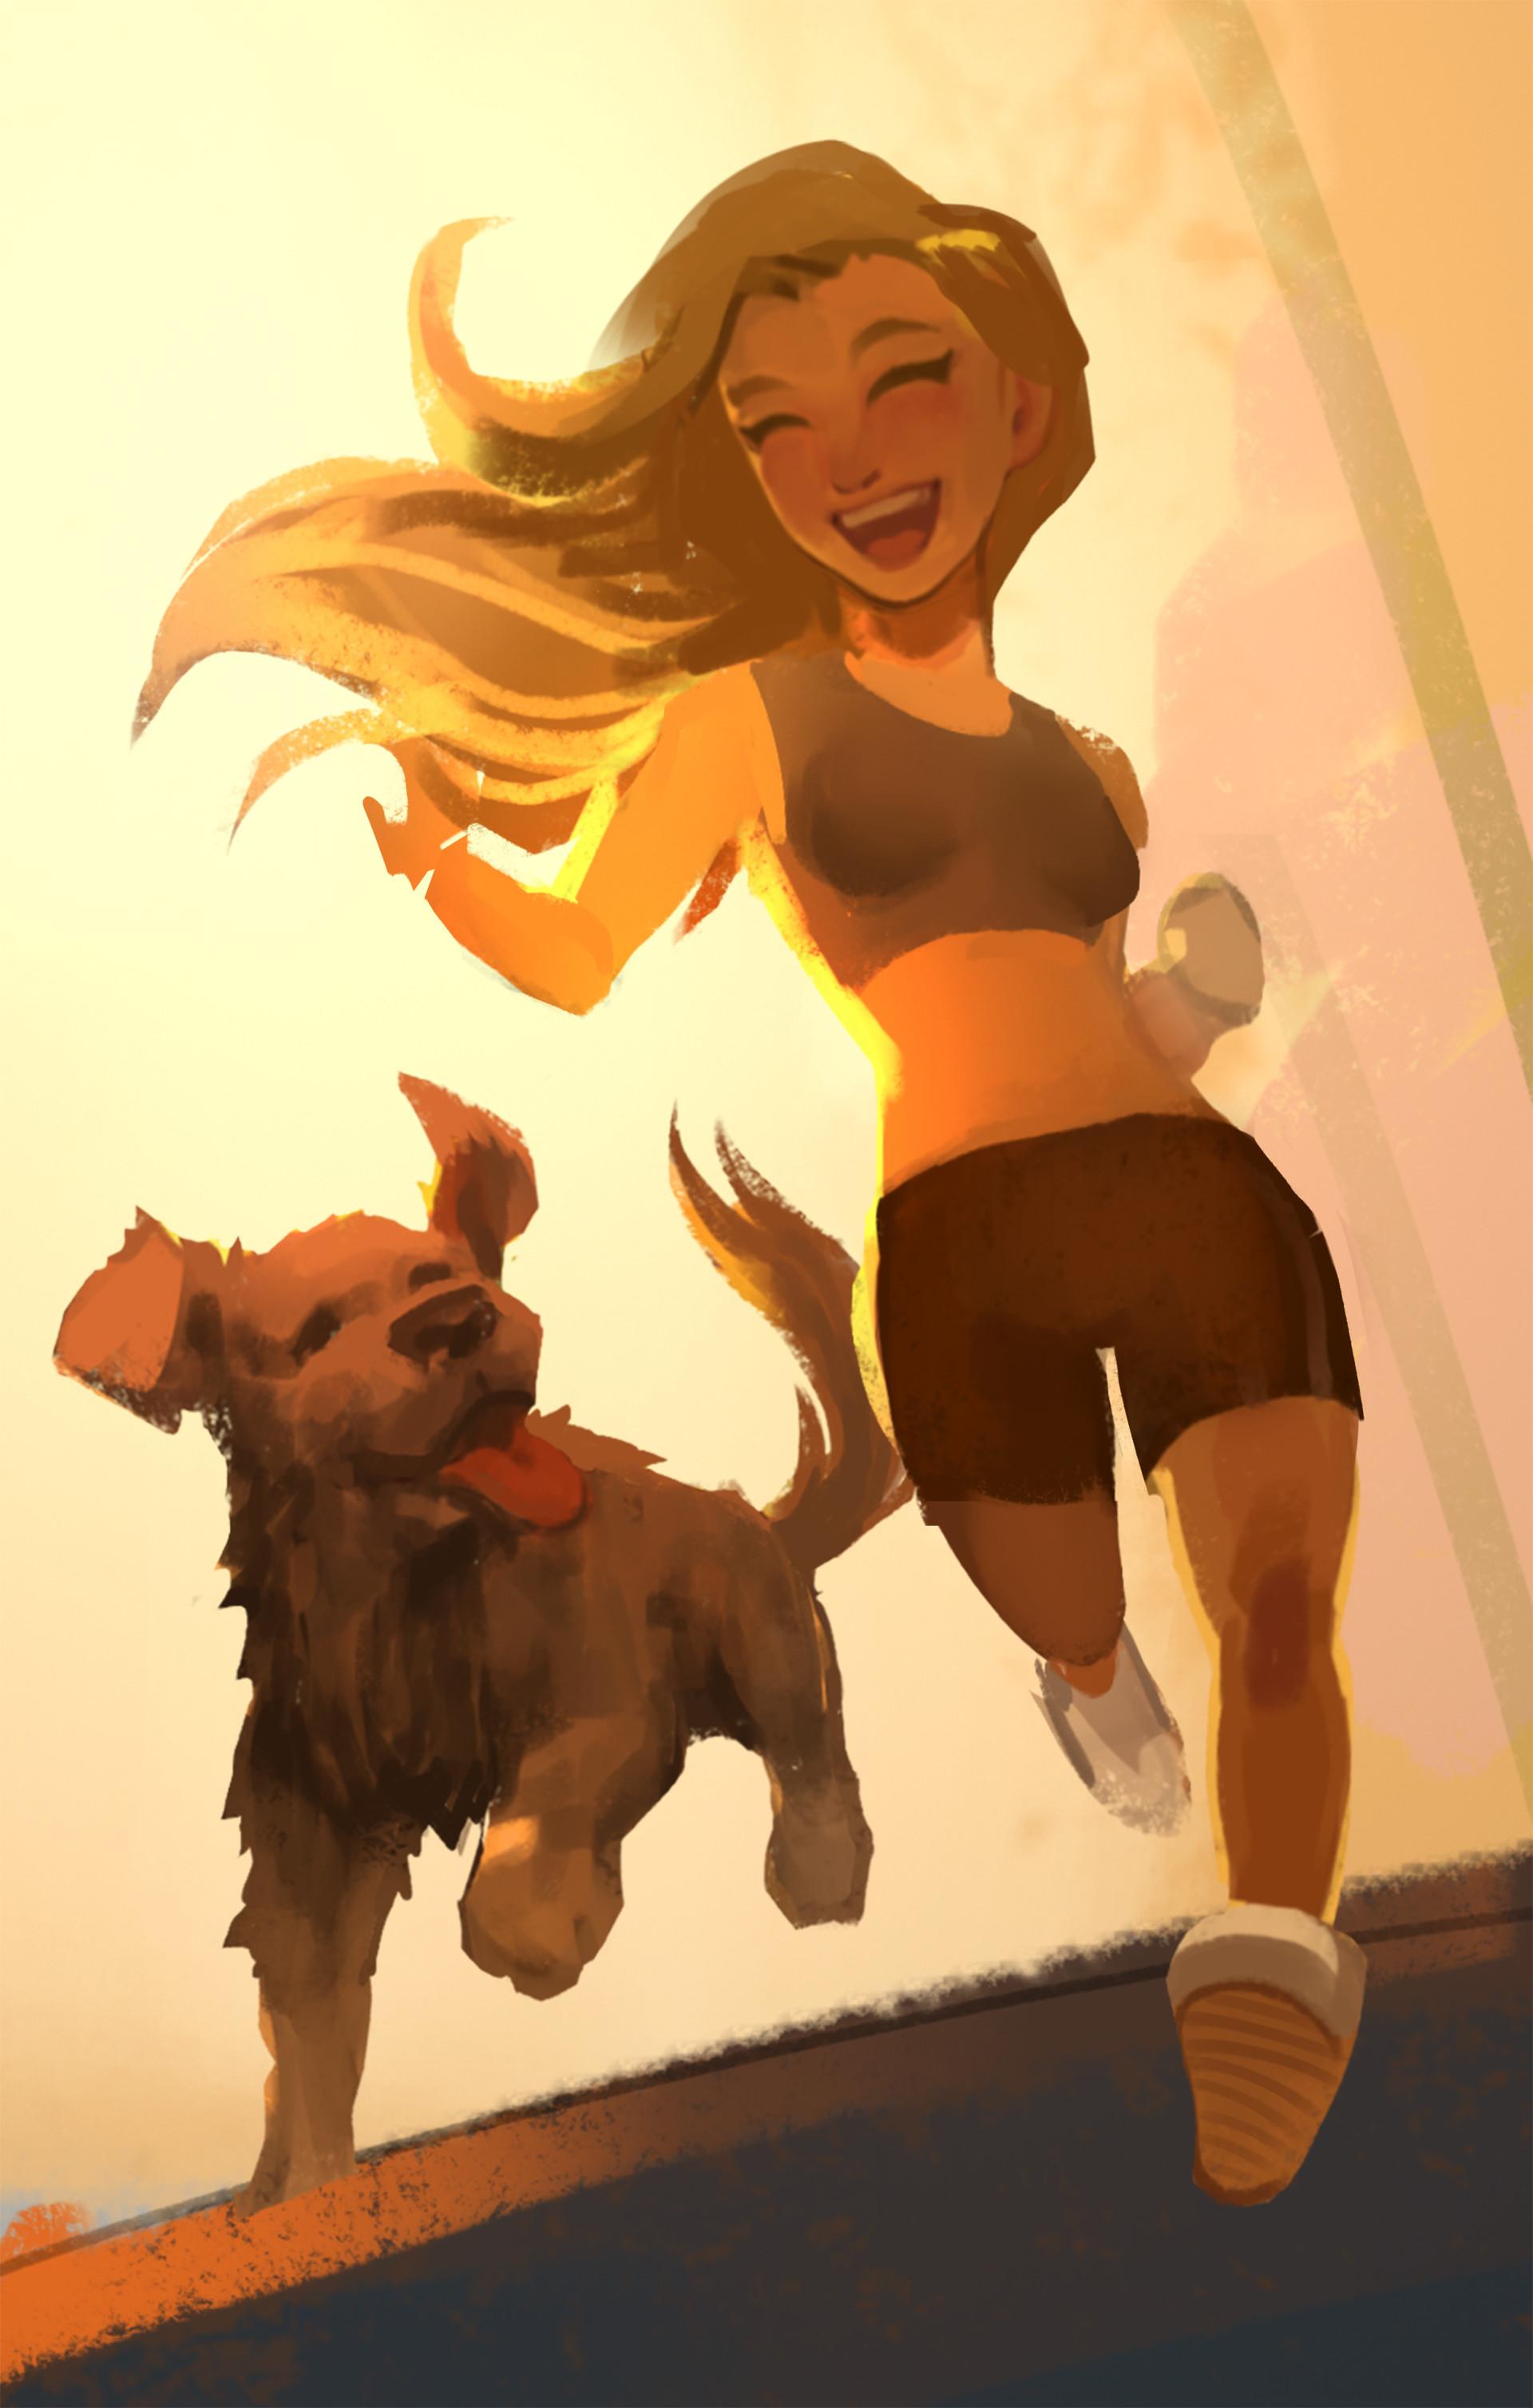 Francis brunet jogger girl1